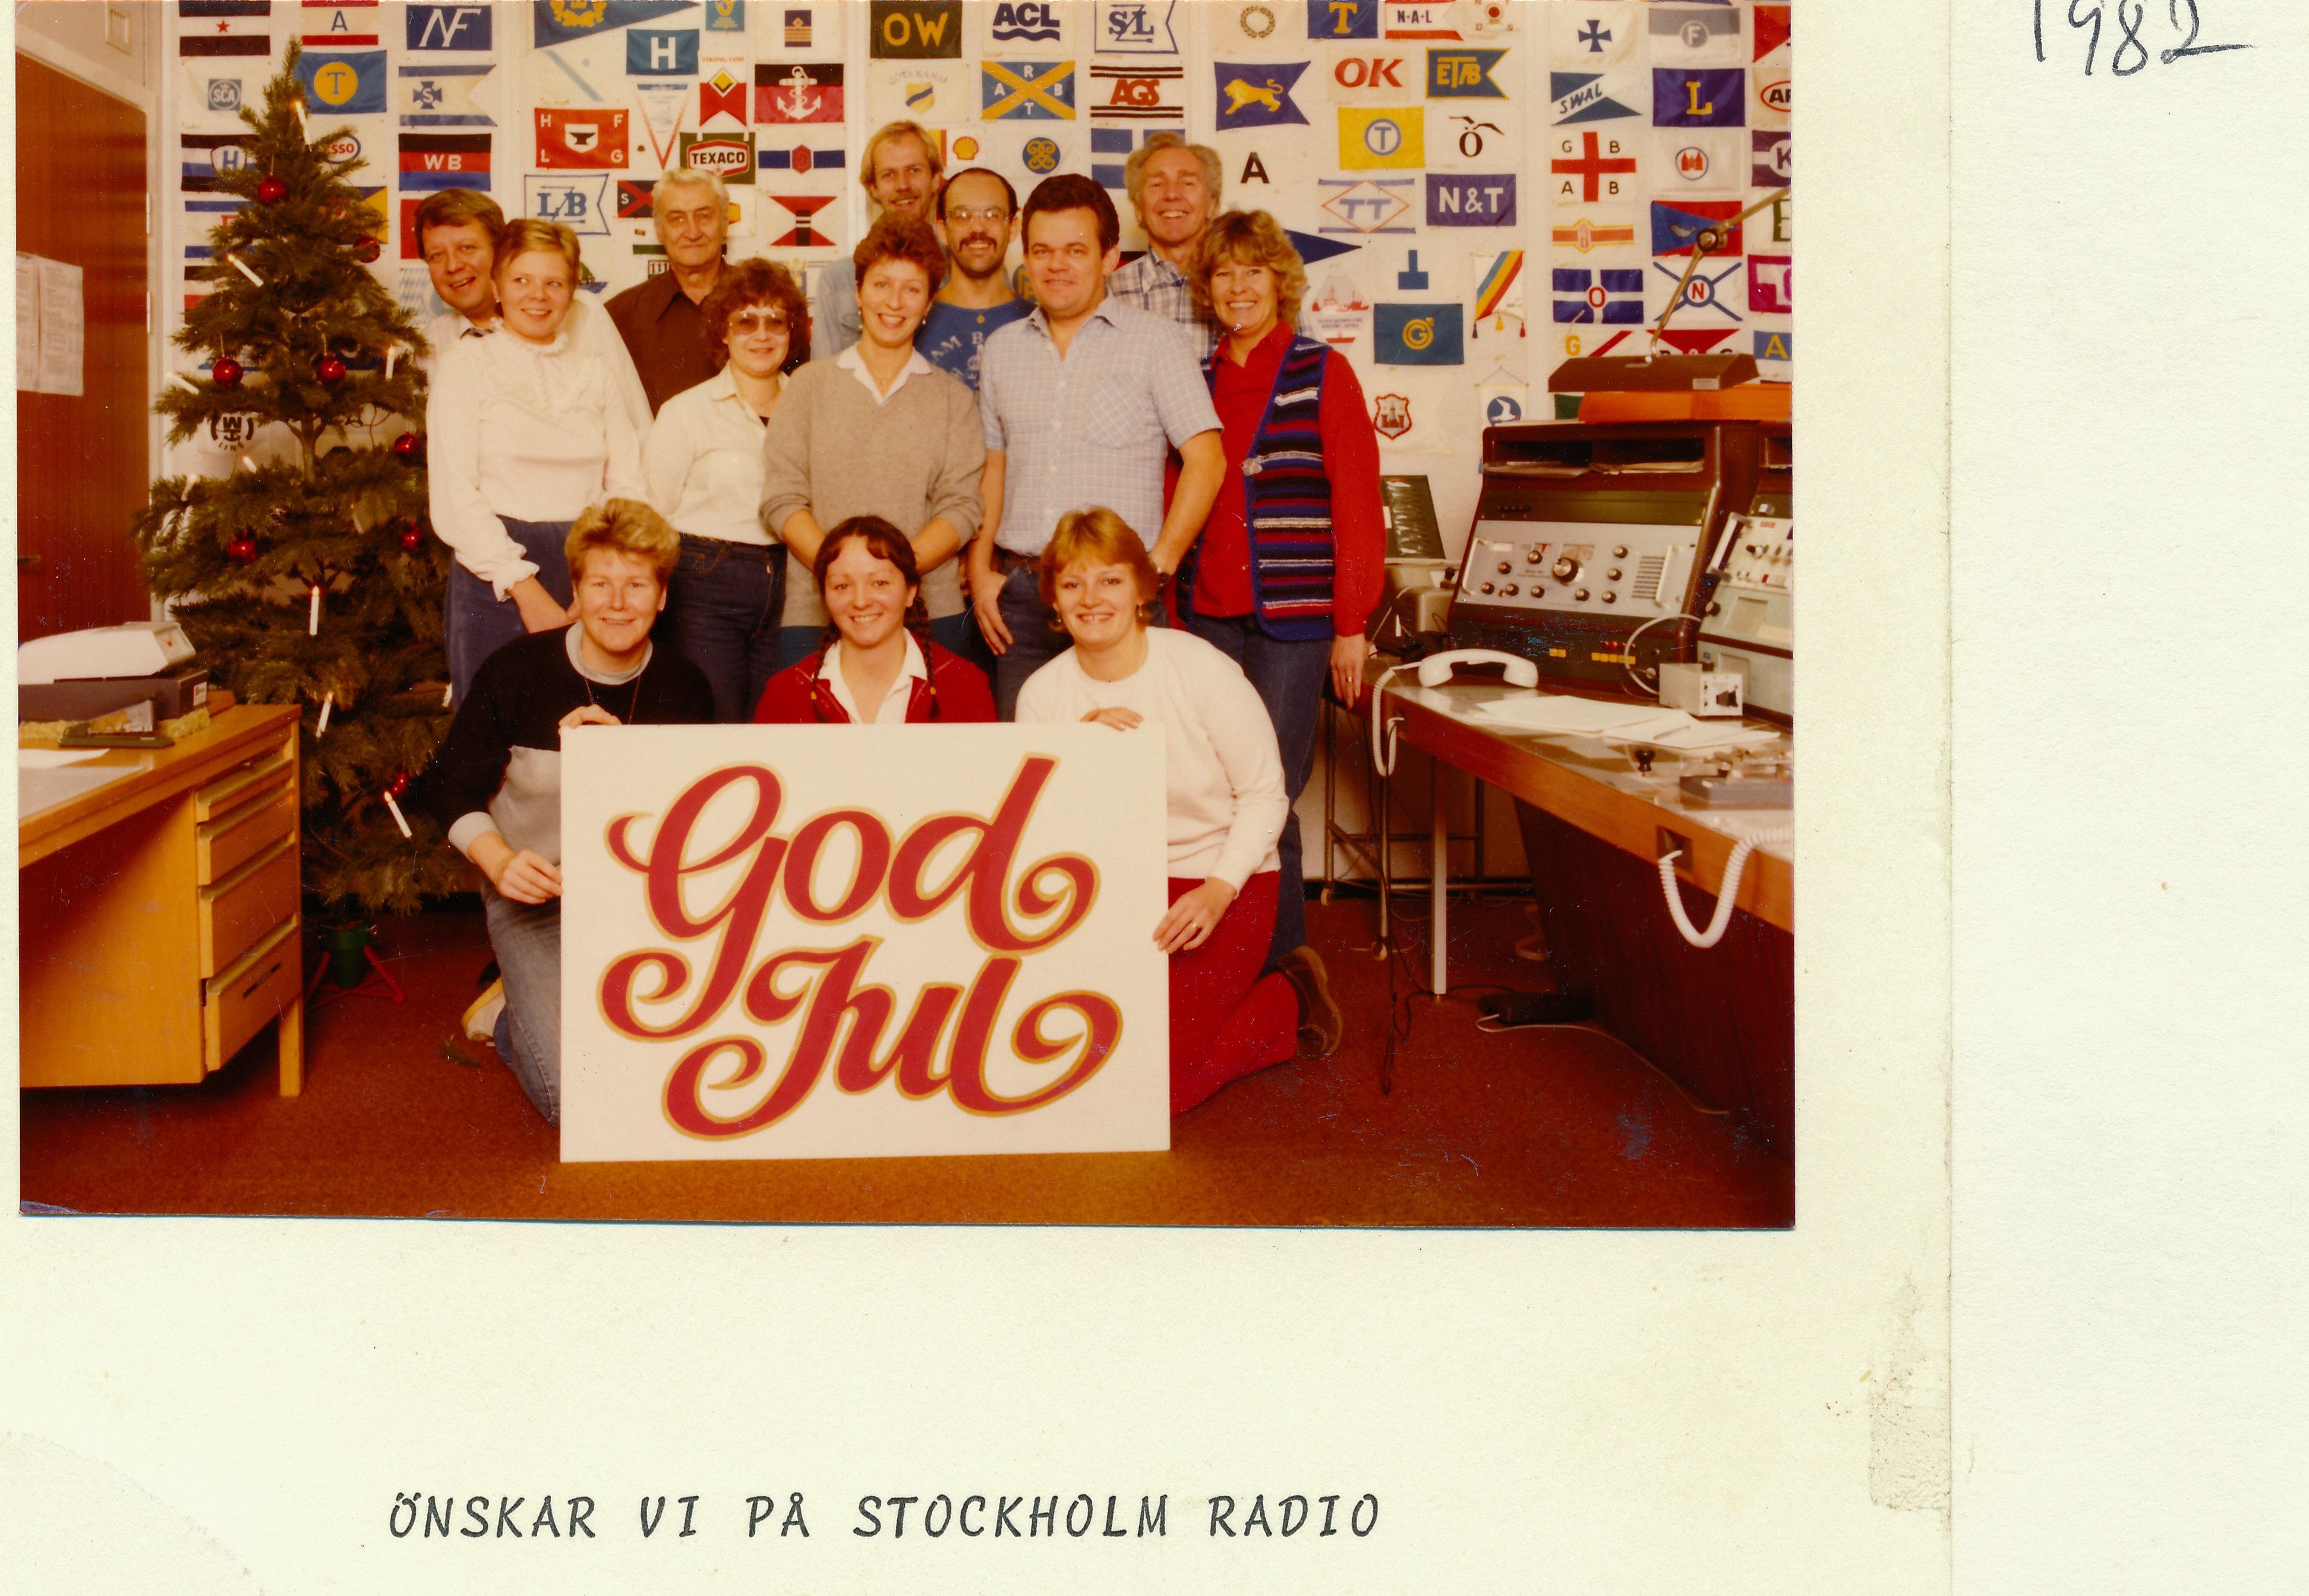 st radio 82